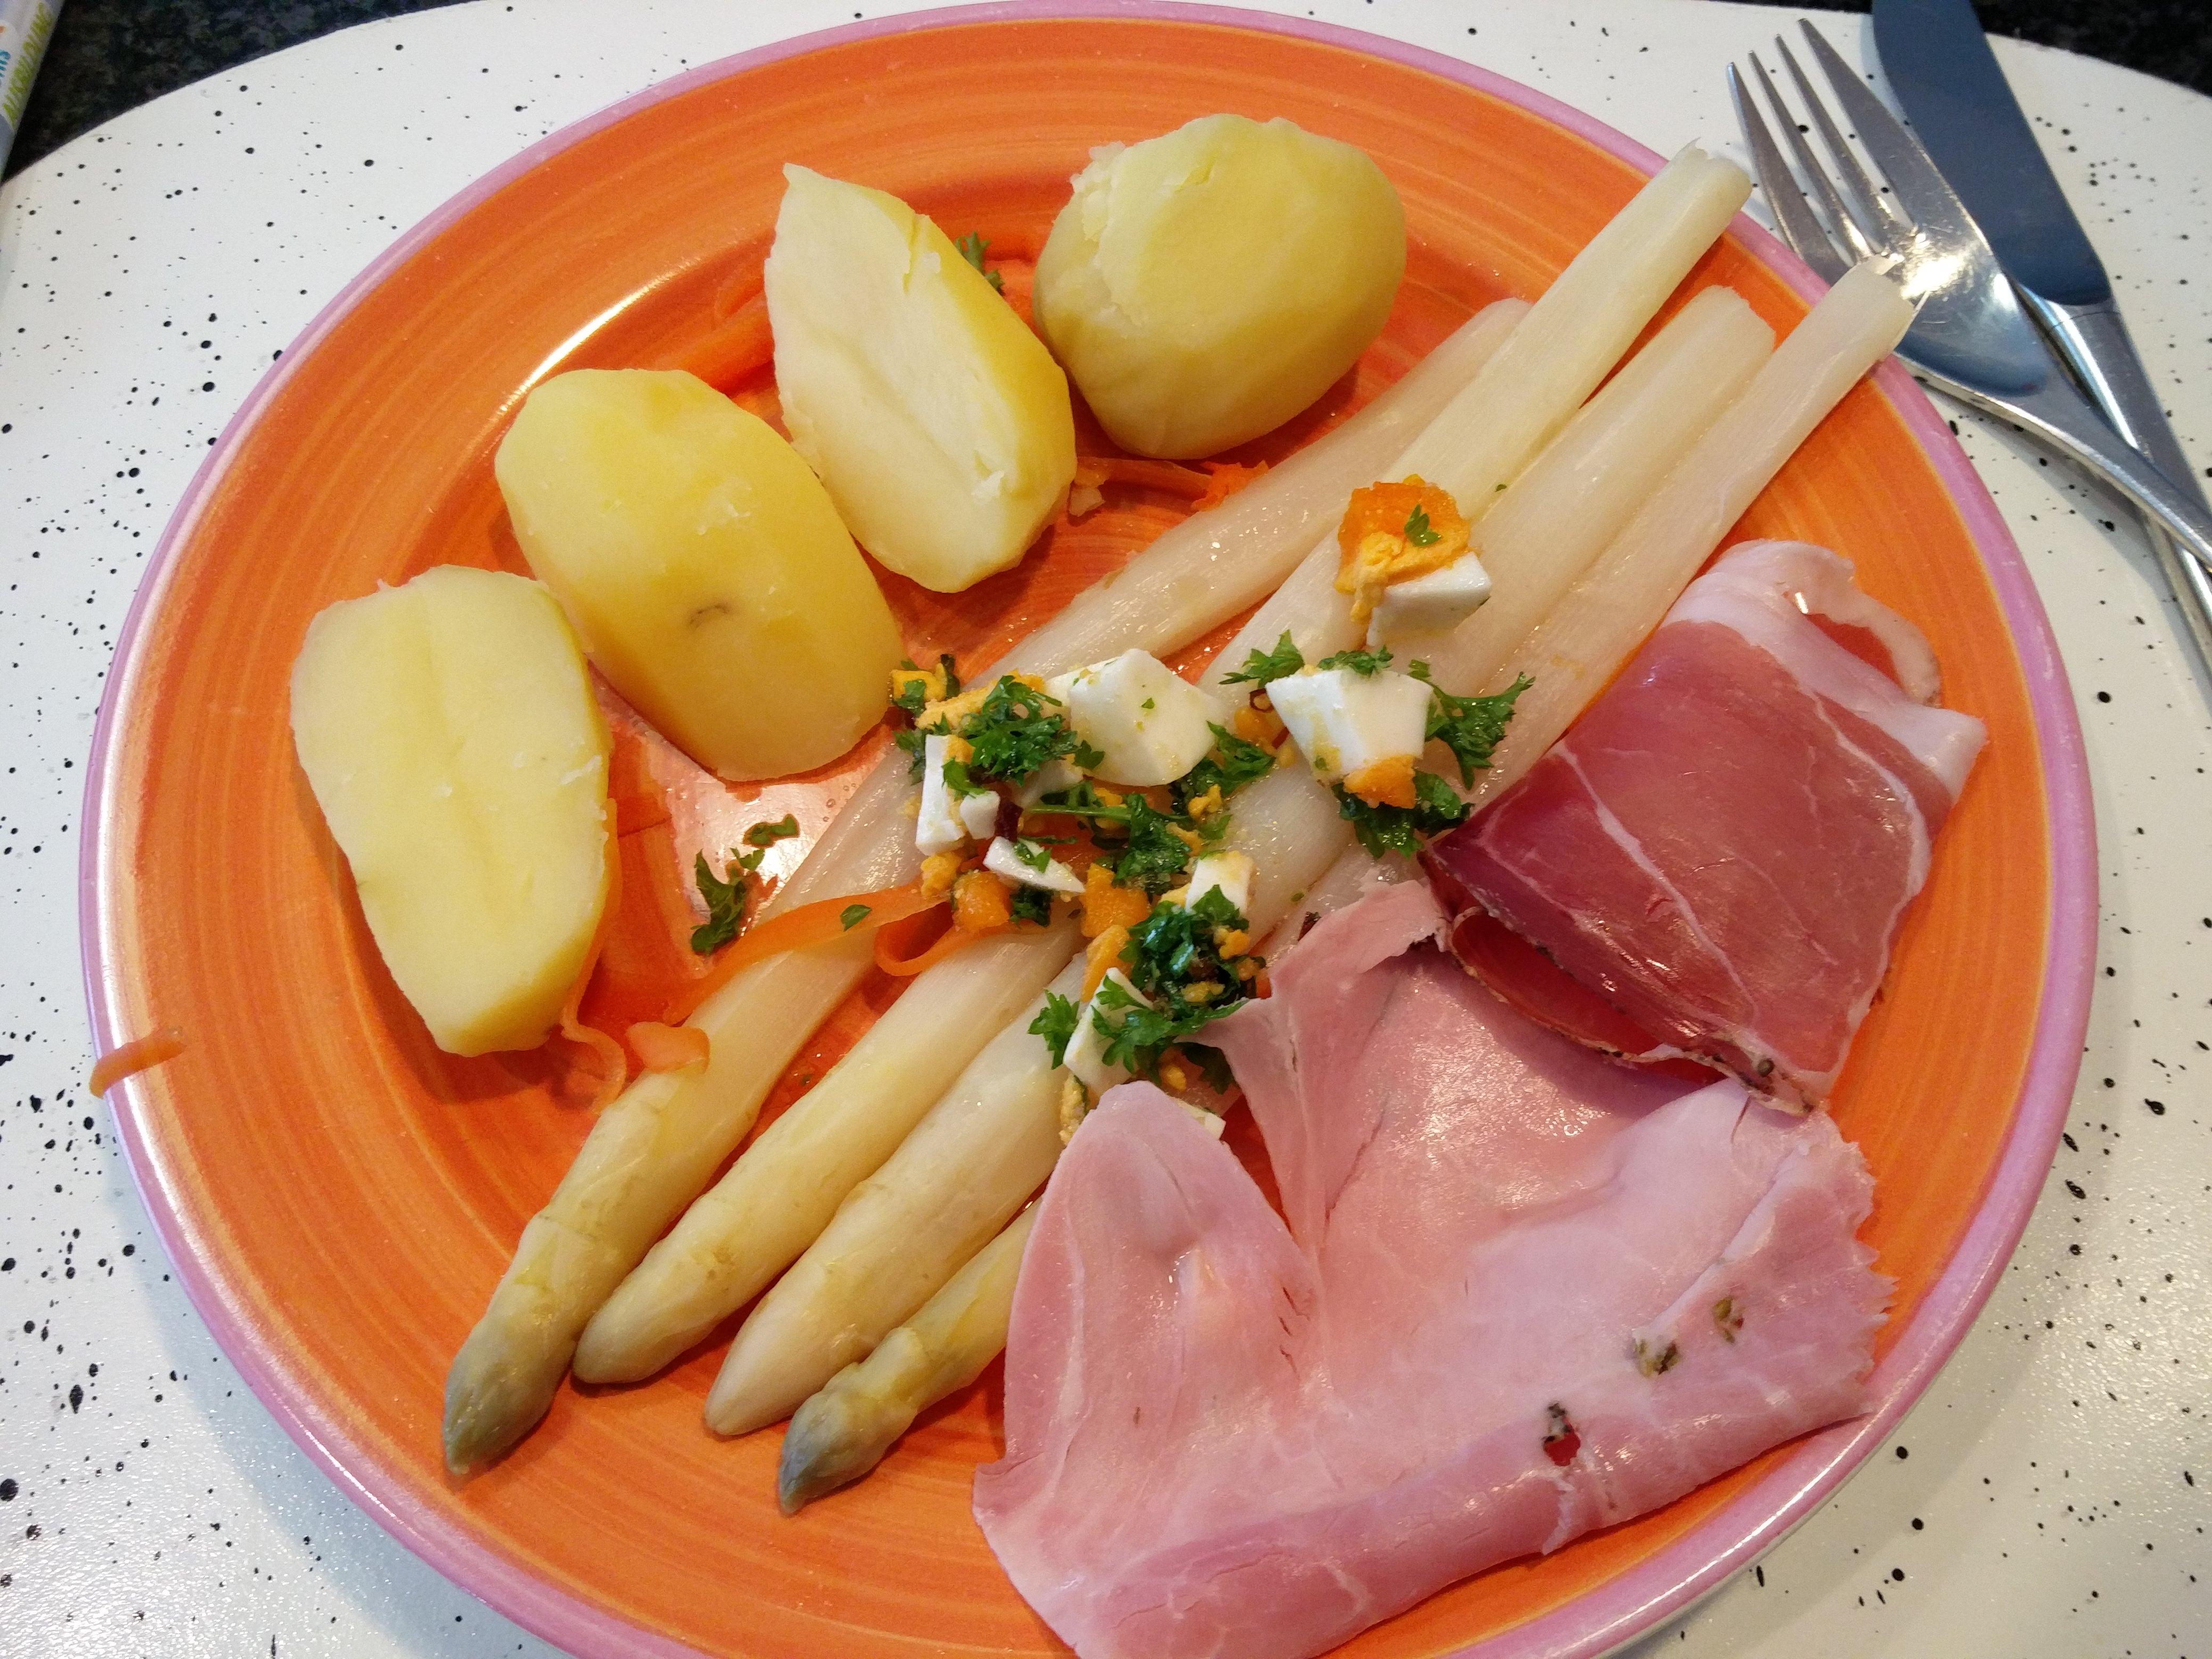 http://foodloader.net/nico_2016-06-21_spargel-schinken-kartoffeln.jpg